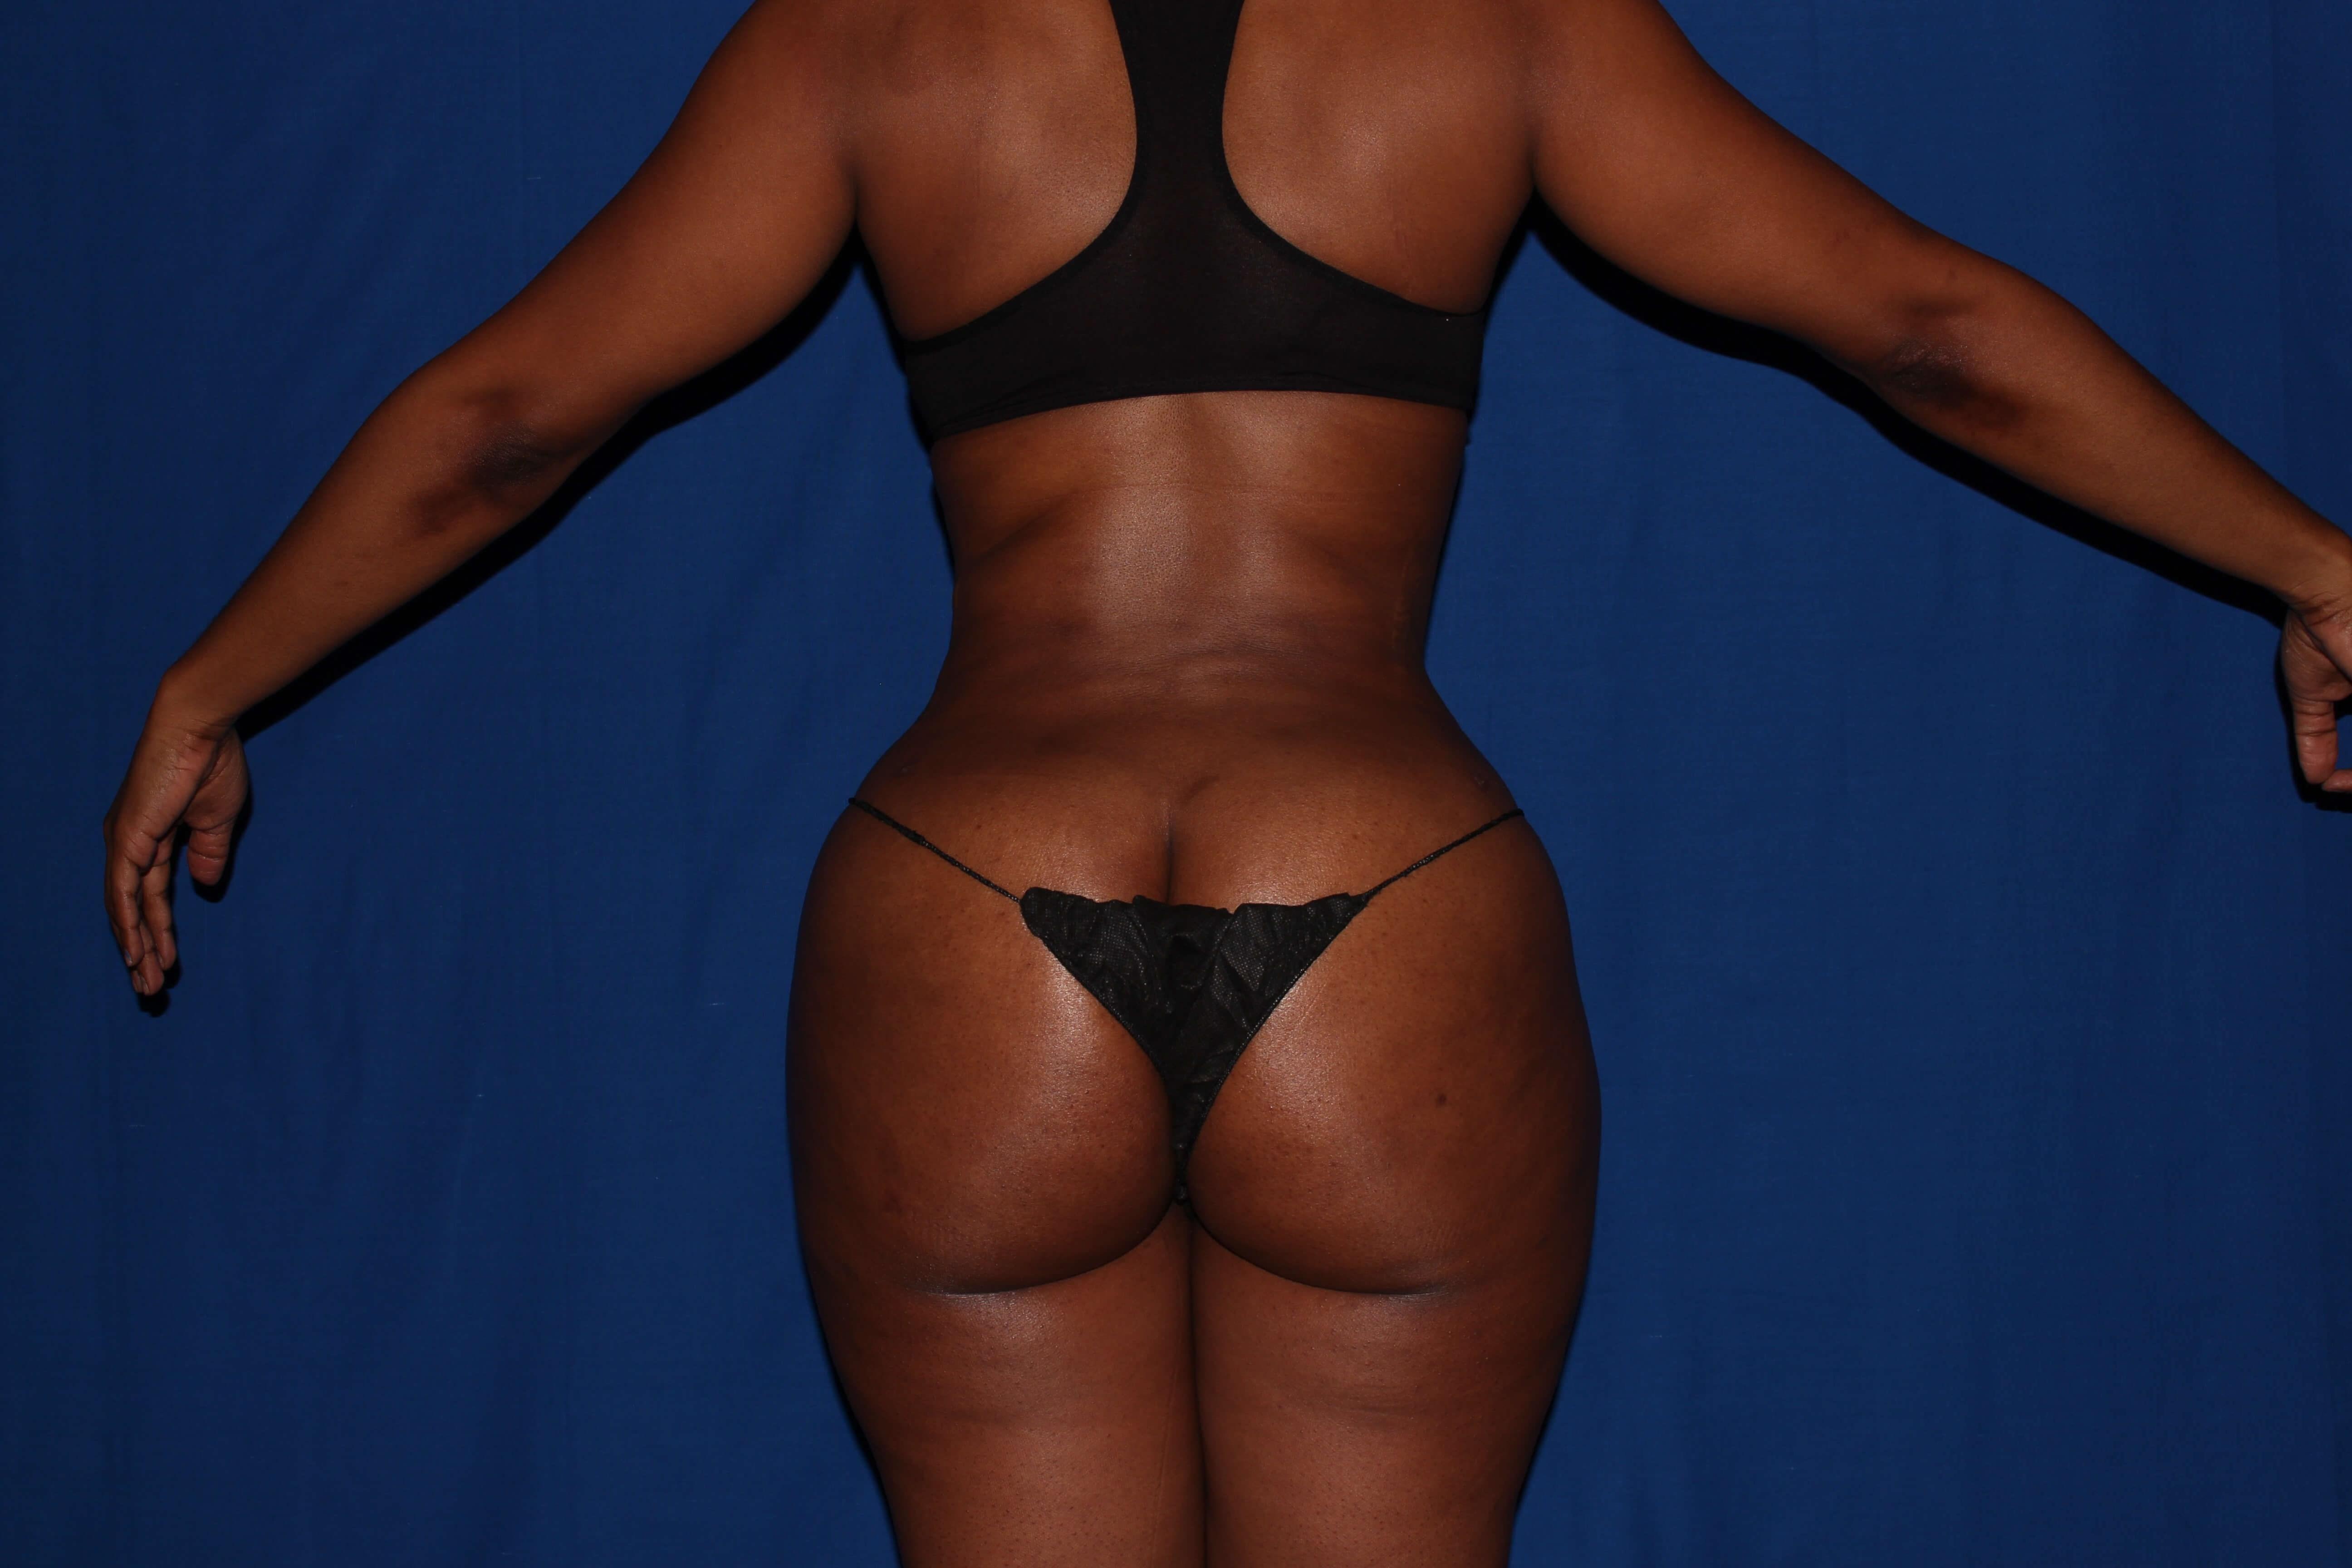 Liposuction with BBL After - Scottsdale, AZ BBL